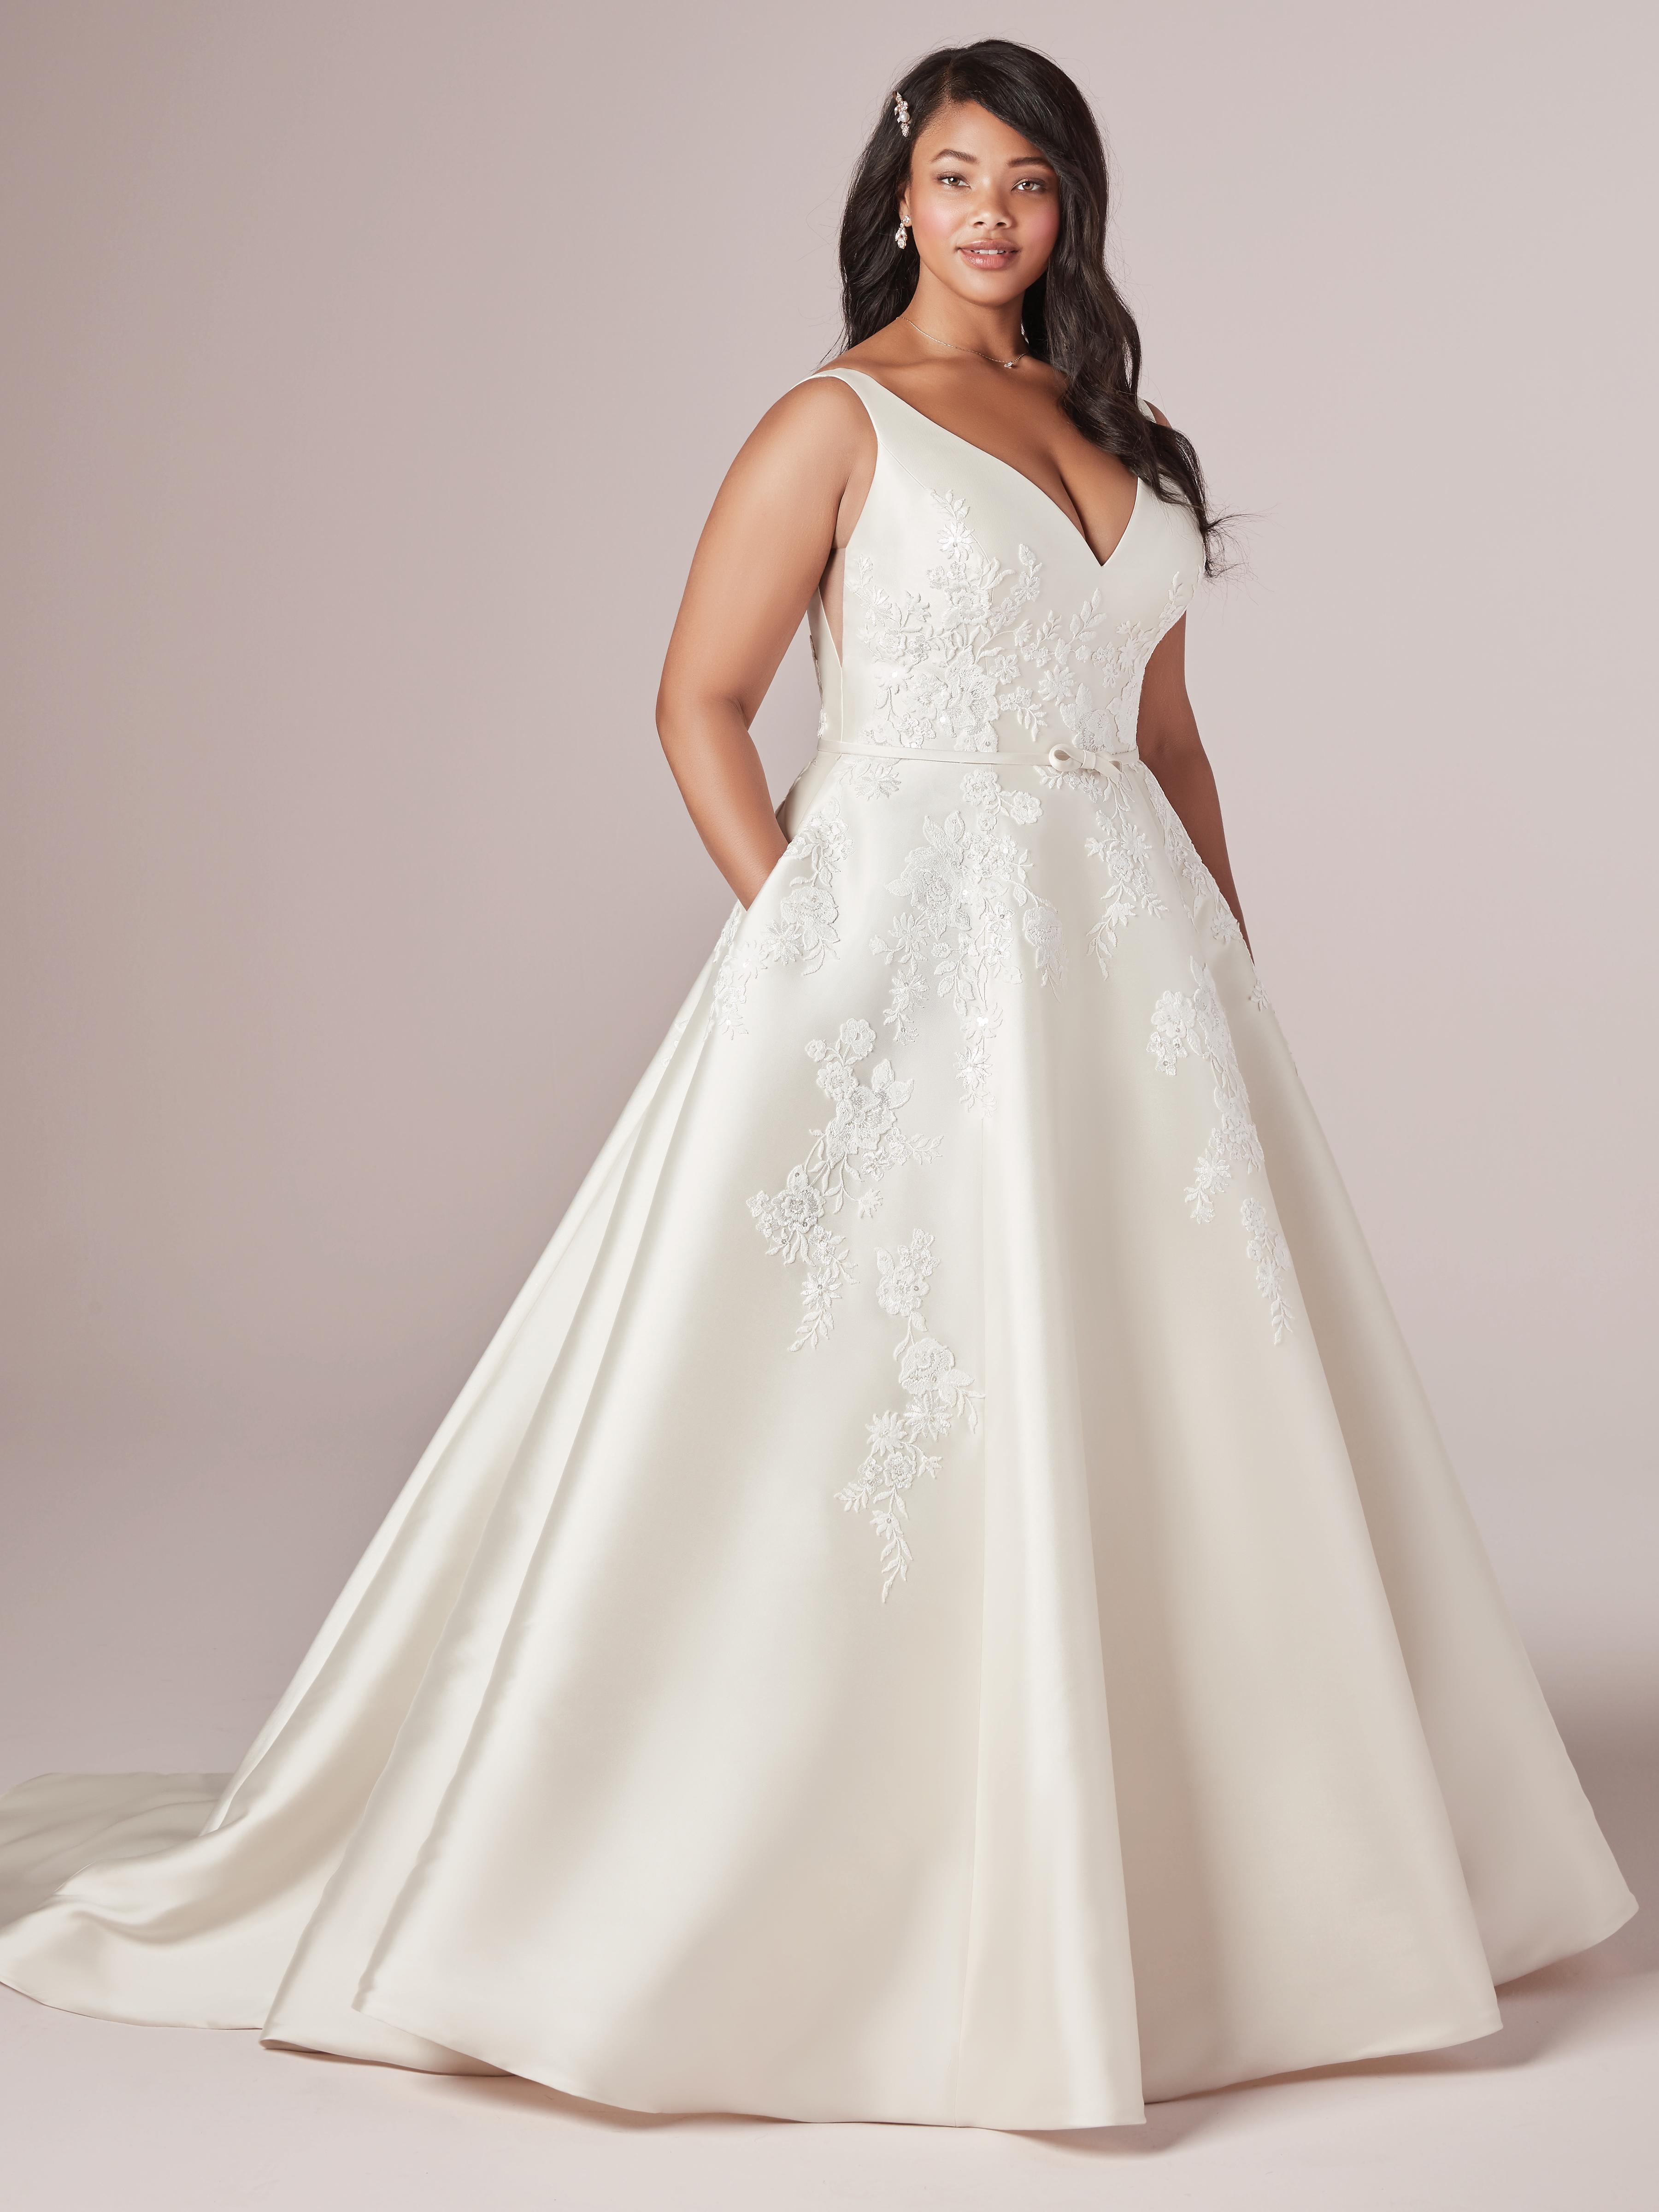 Valerie Lynette Lace Ballgown Wedding Dress by Rebecca Ingram